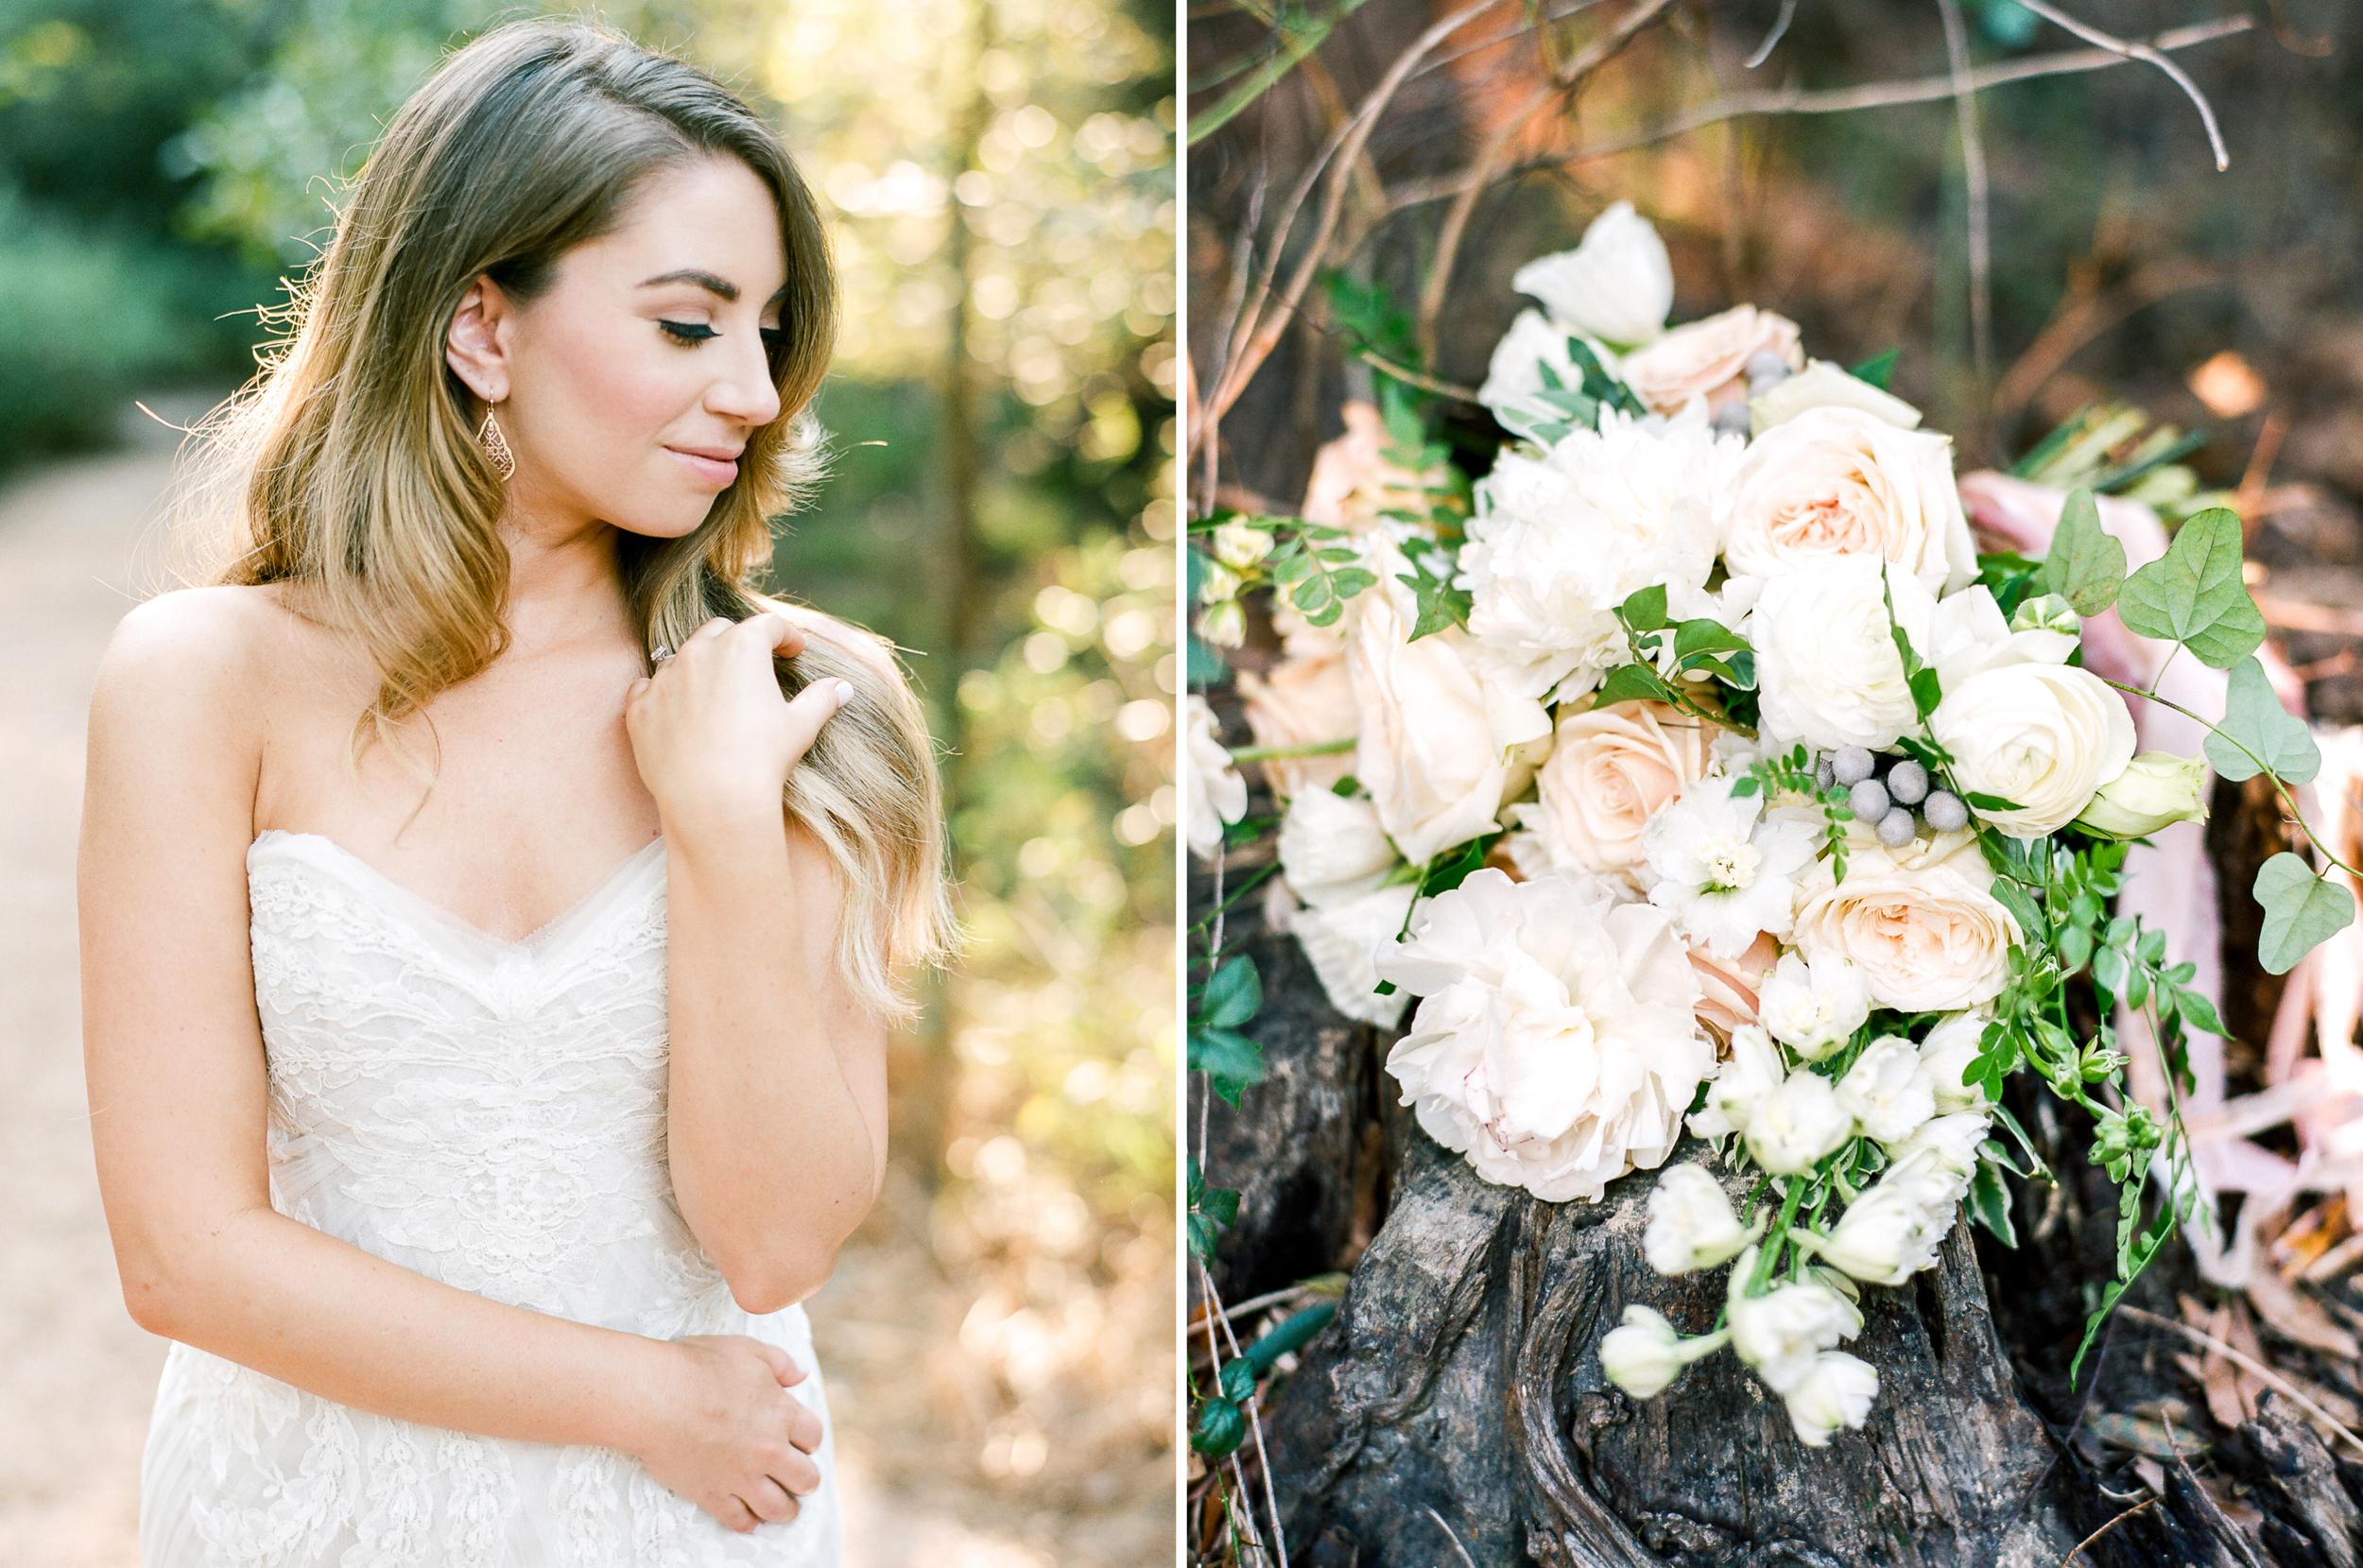 dana-fernandez-photography-the-wedding-chicks-film-houston-wedding-photography-destination-101-141.jpg